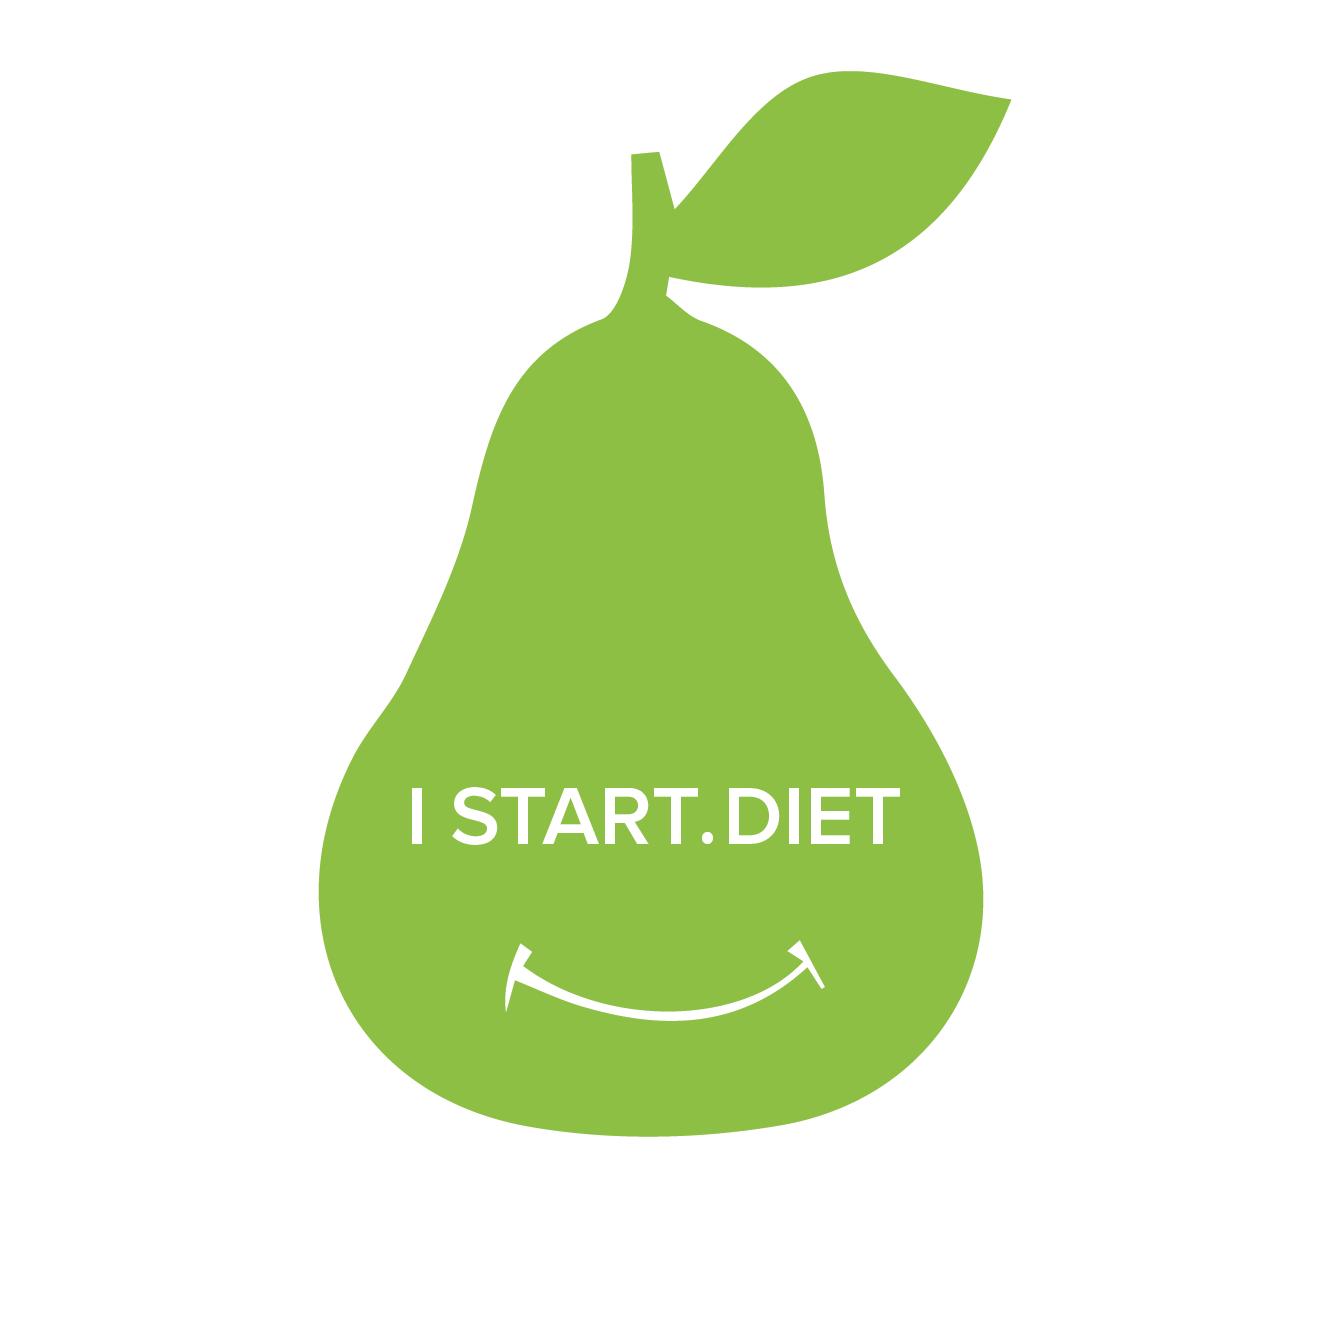 Партнёры конкурса I.start.diet (www.istart.diet)